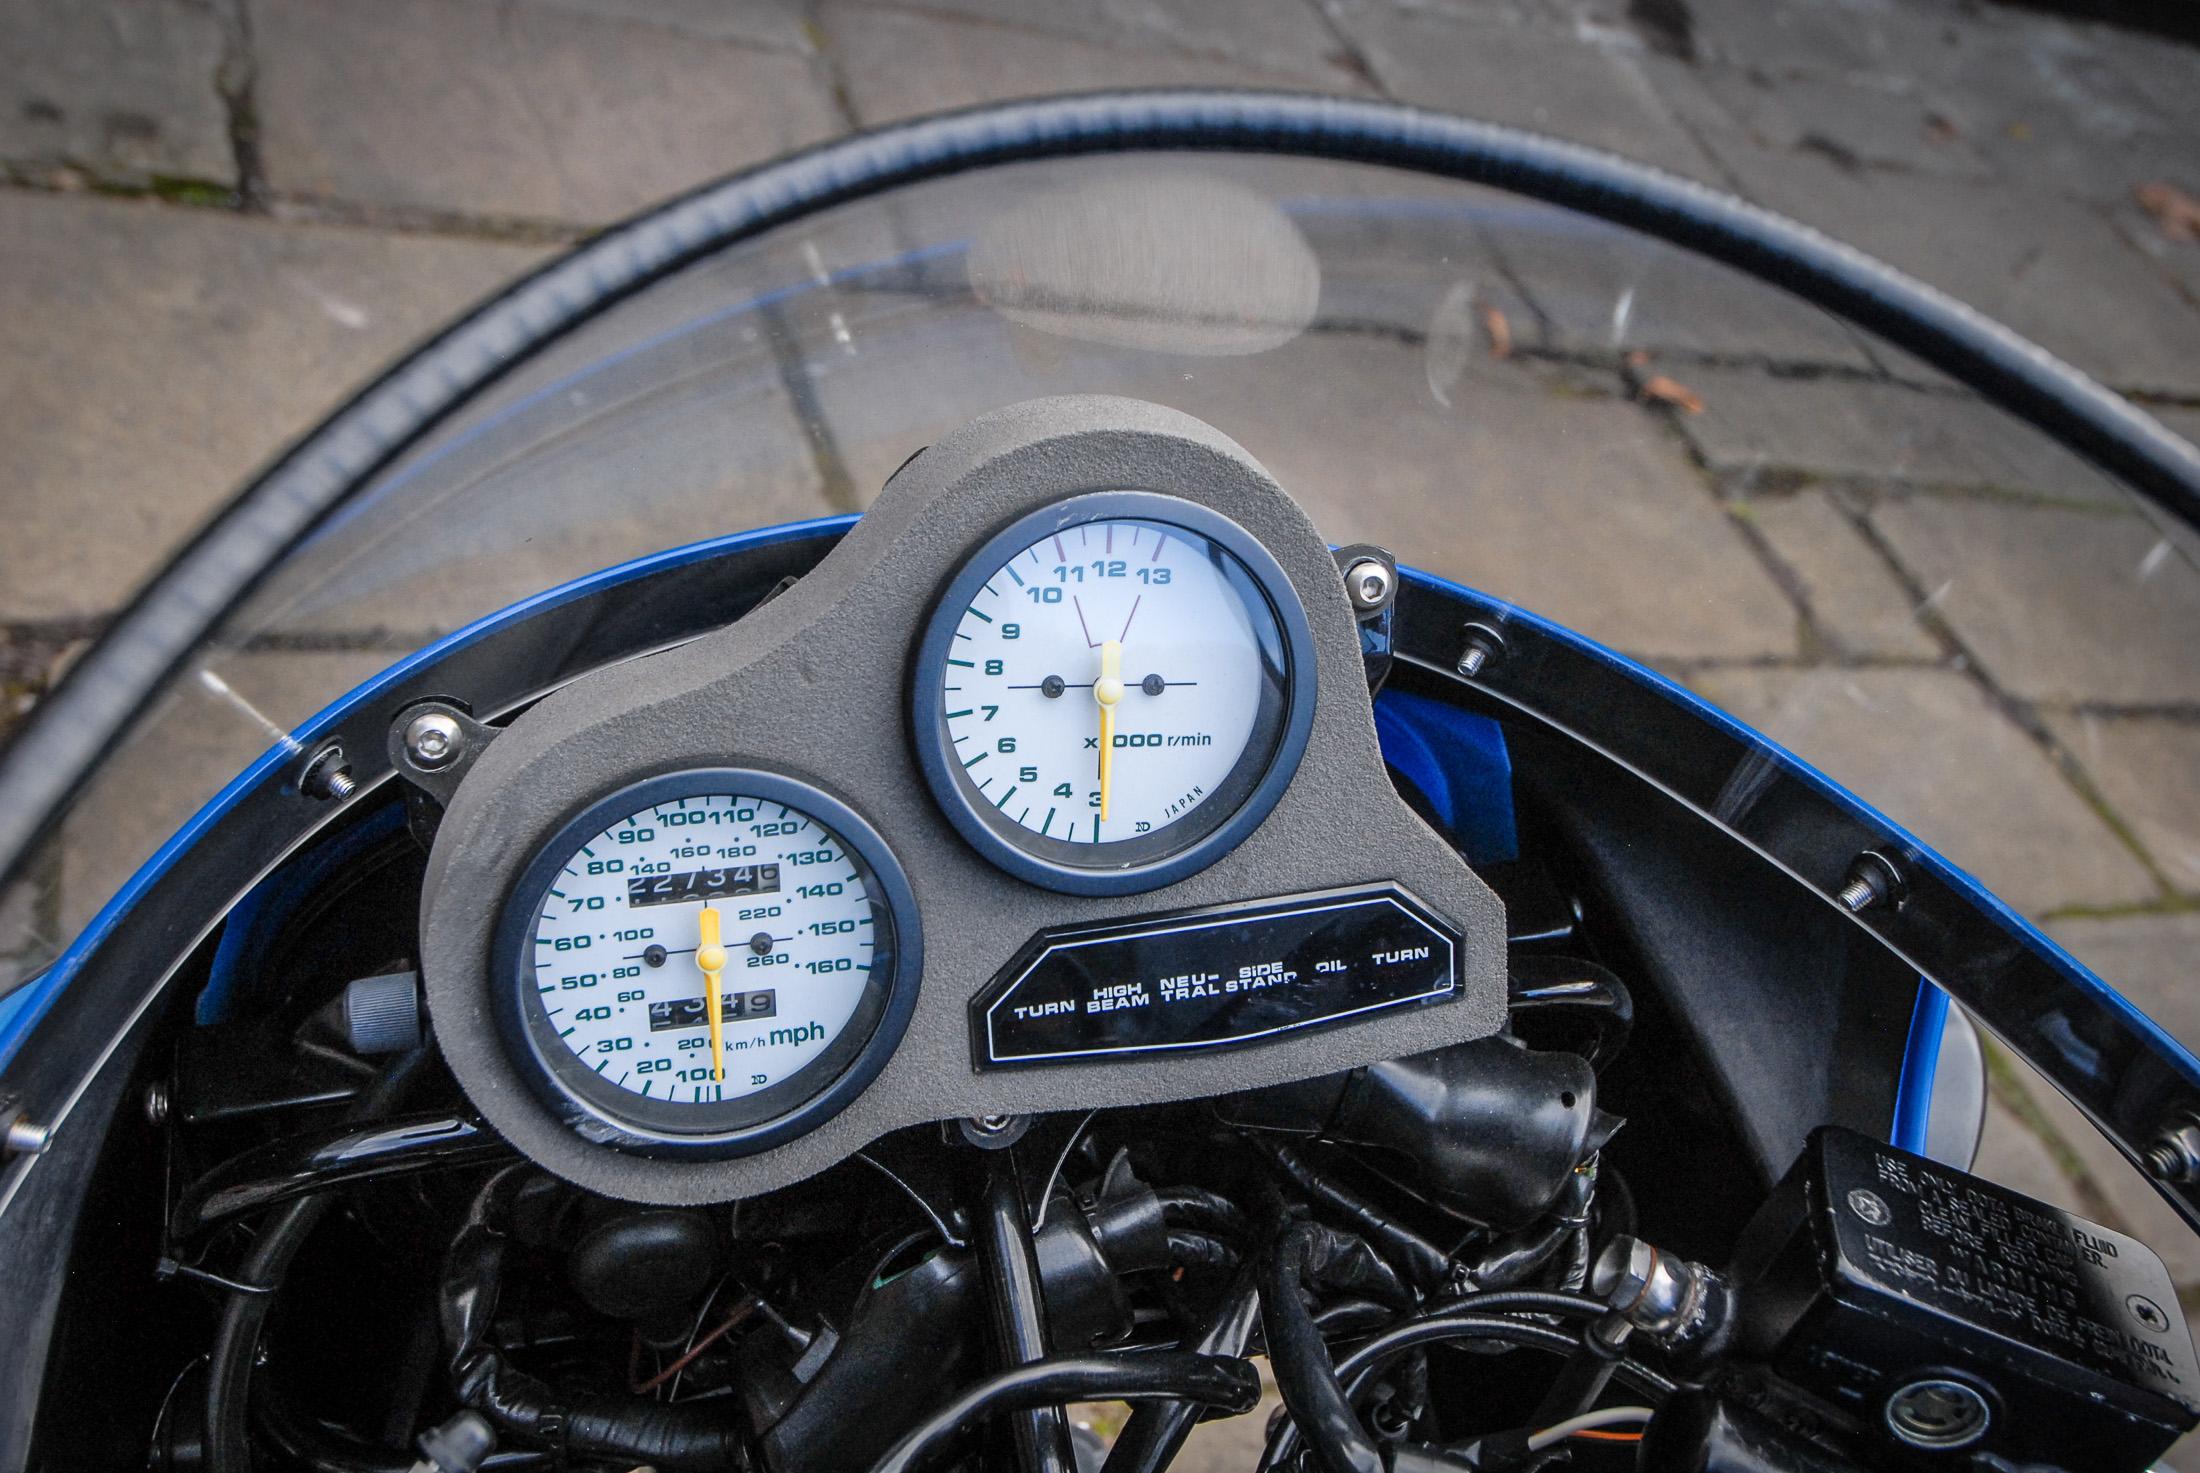 GSX-R750 clocks